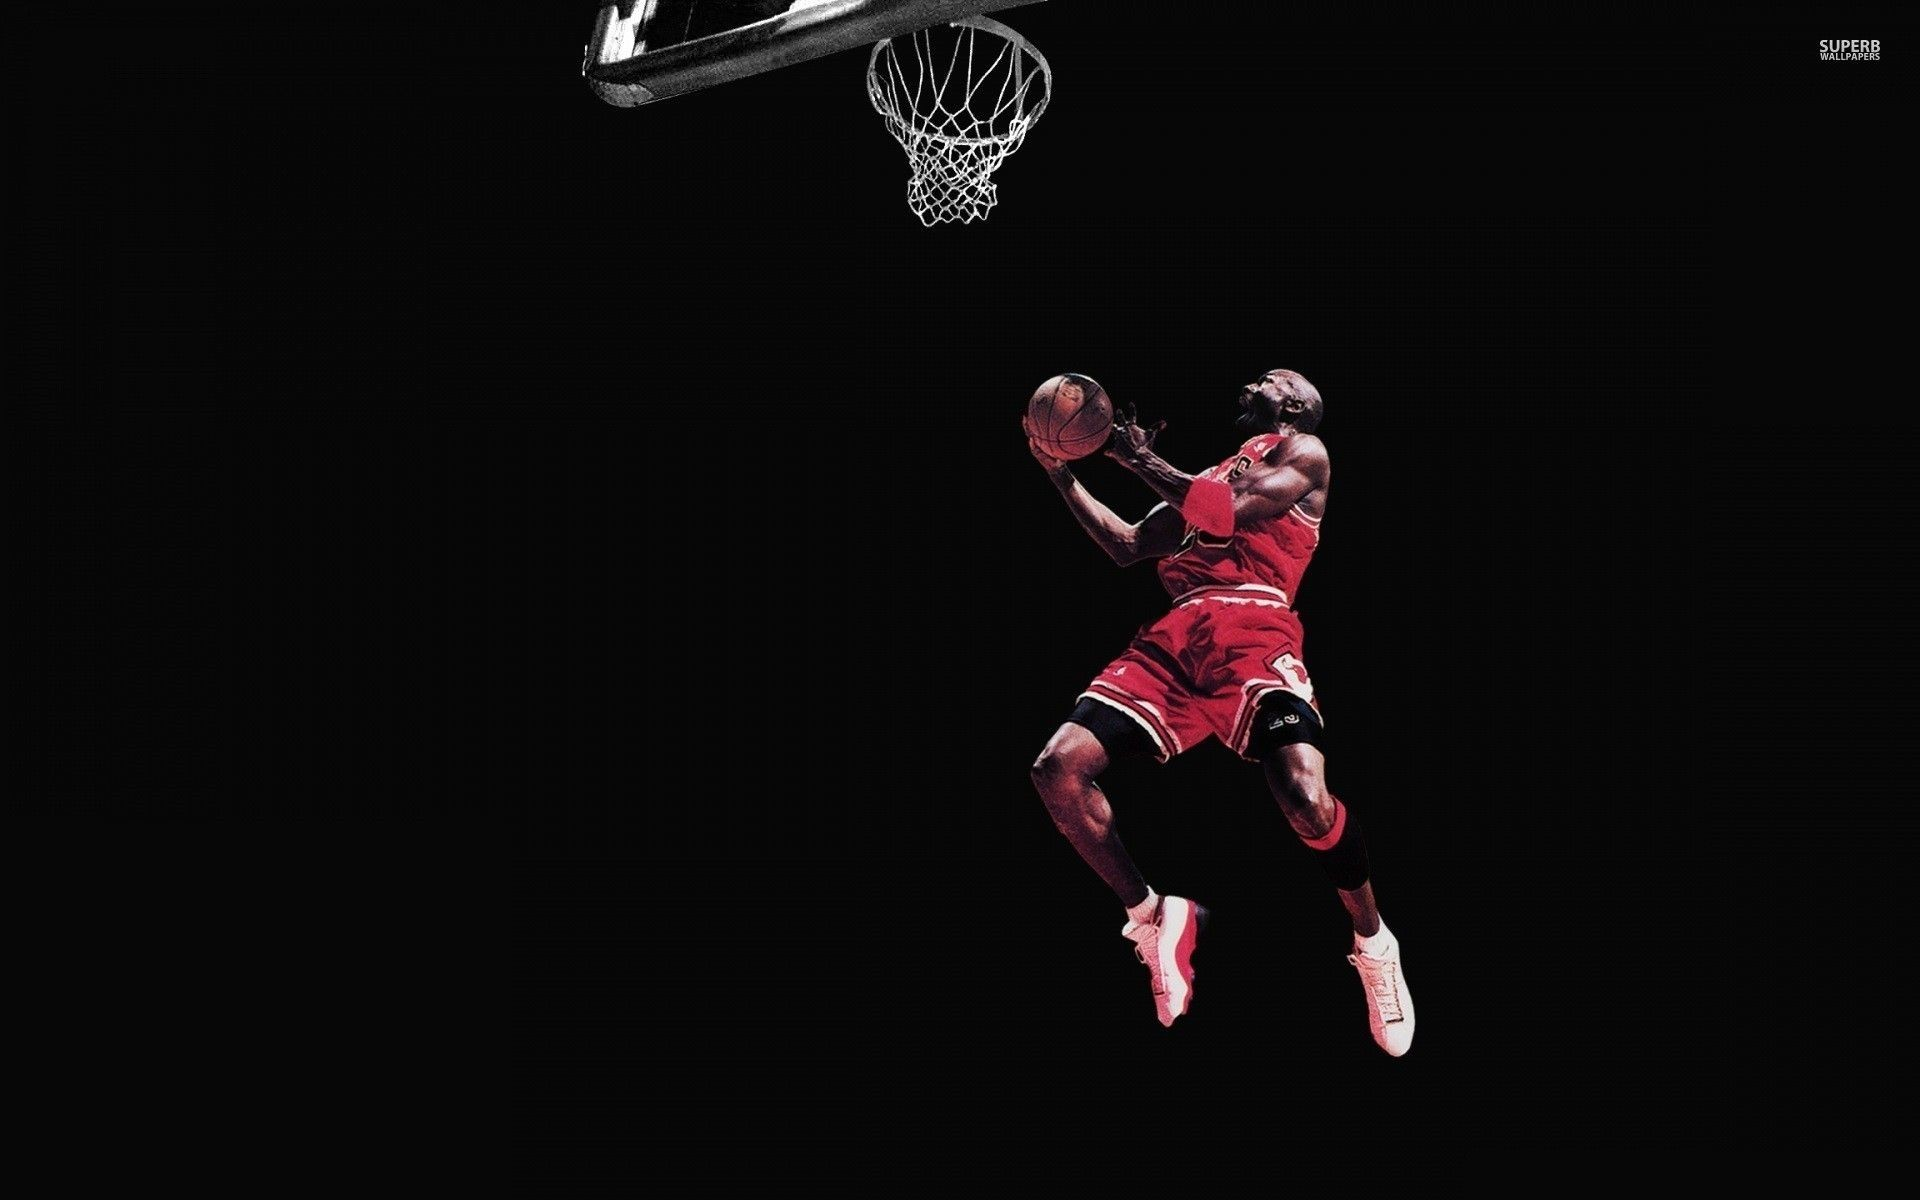 HD Quality Michael Jordan Dunk Wallpaper HD – SiWallpaper 20716